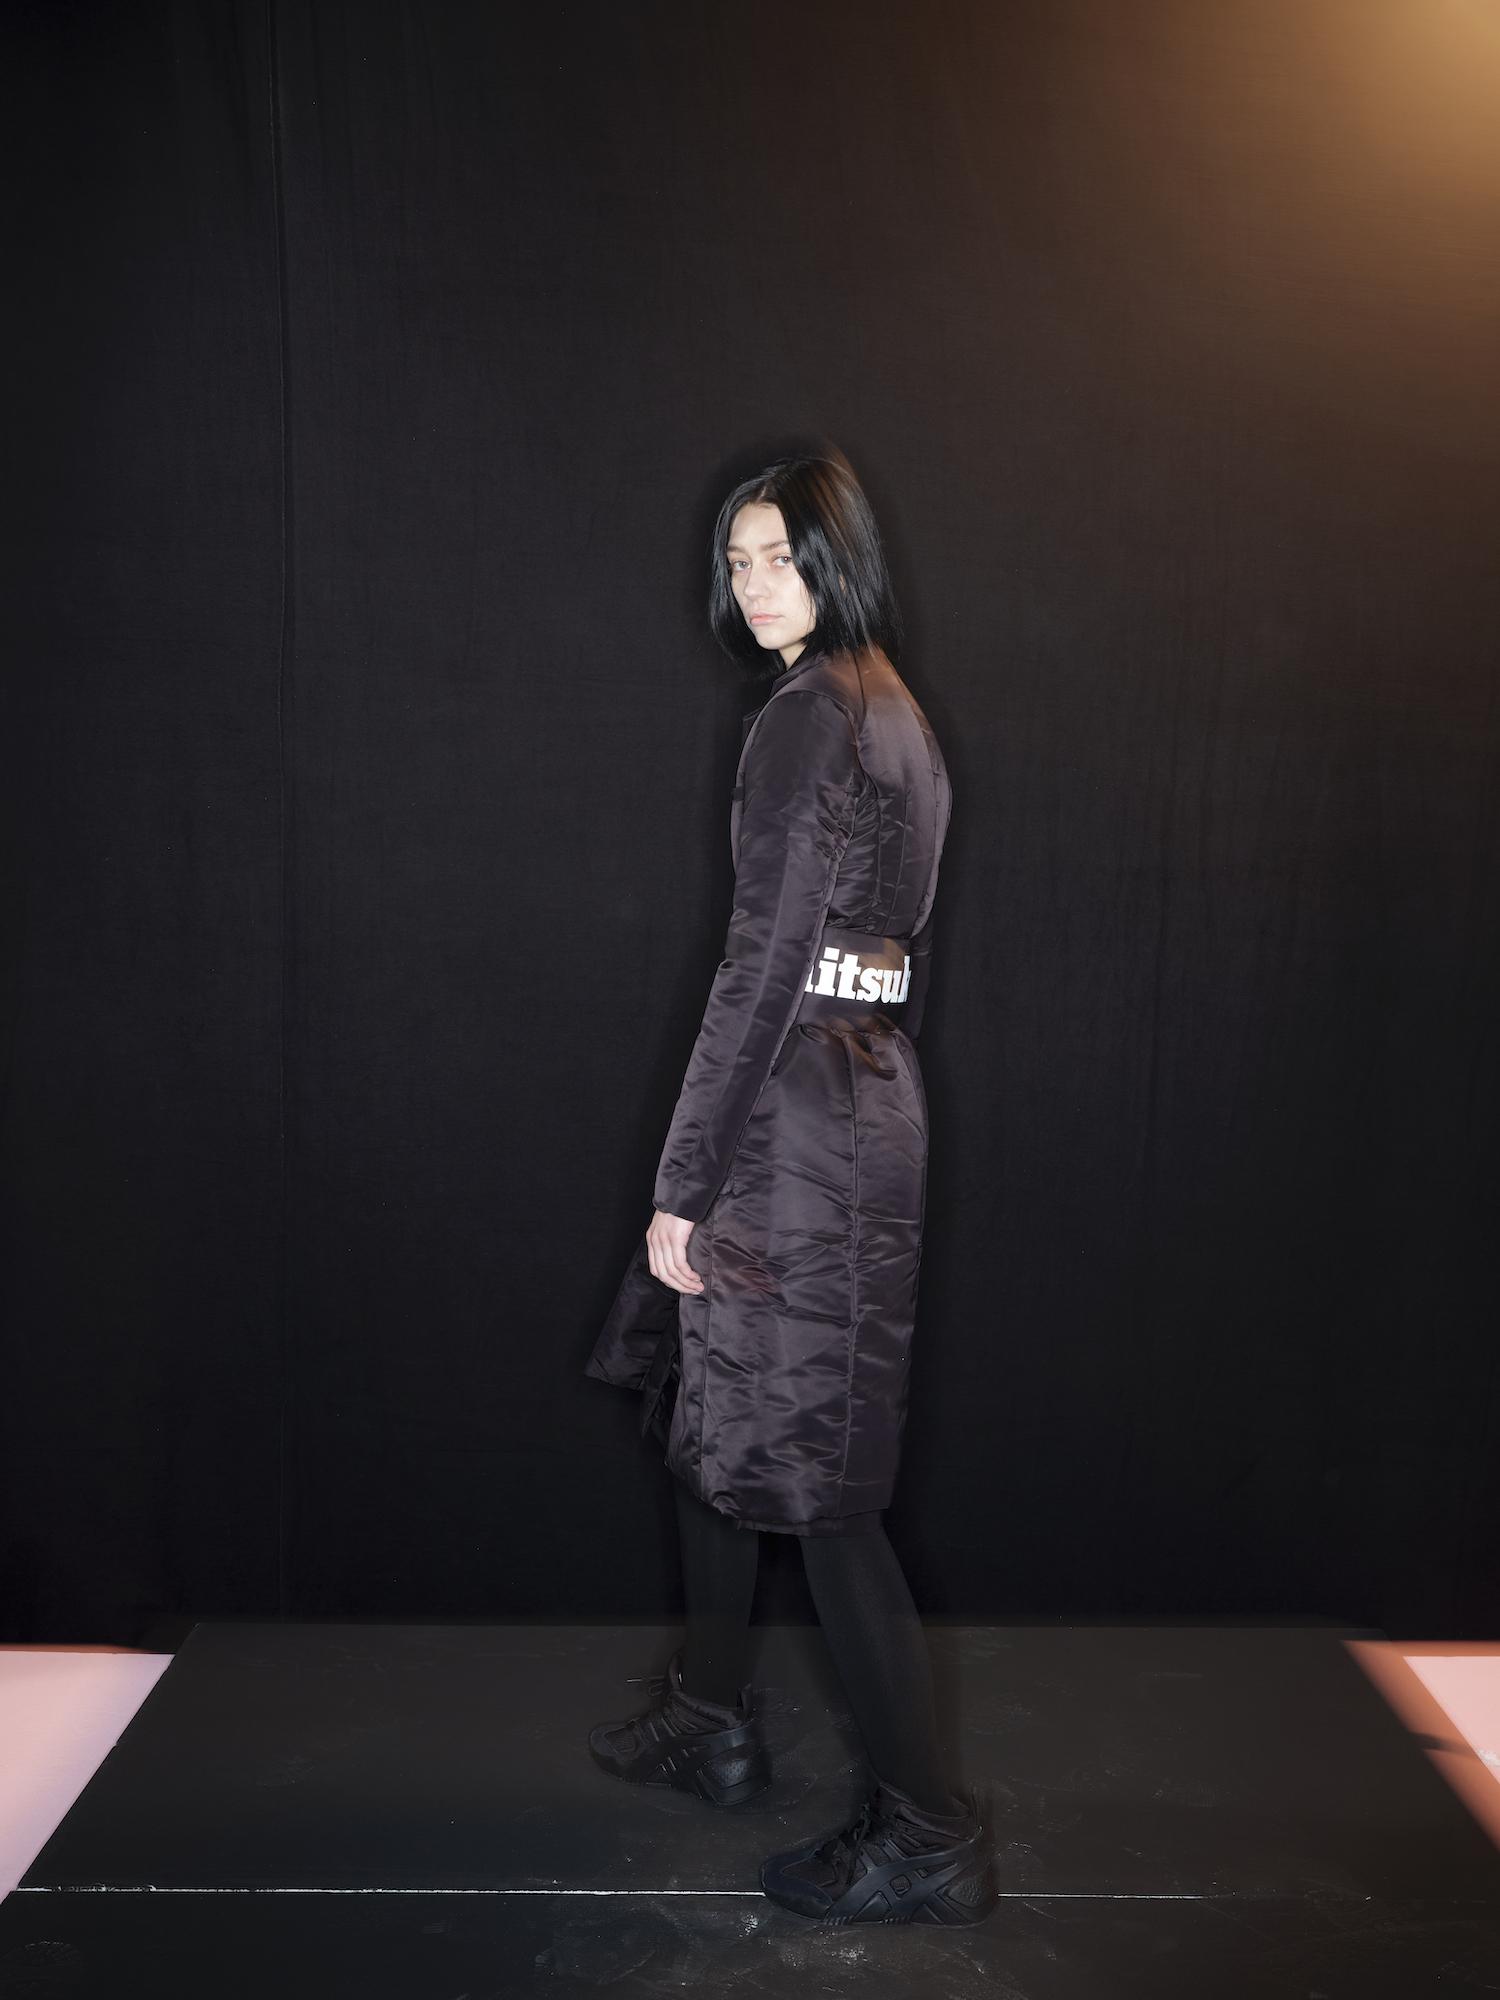 Onitsuka Tiger Autumn _ Winter 2021 collection_Milan Fashion Show_37.jpg